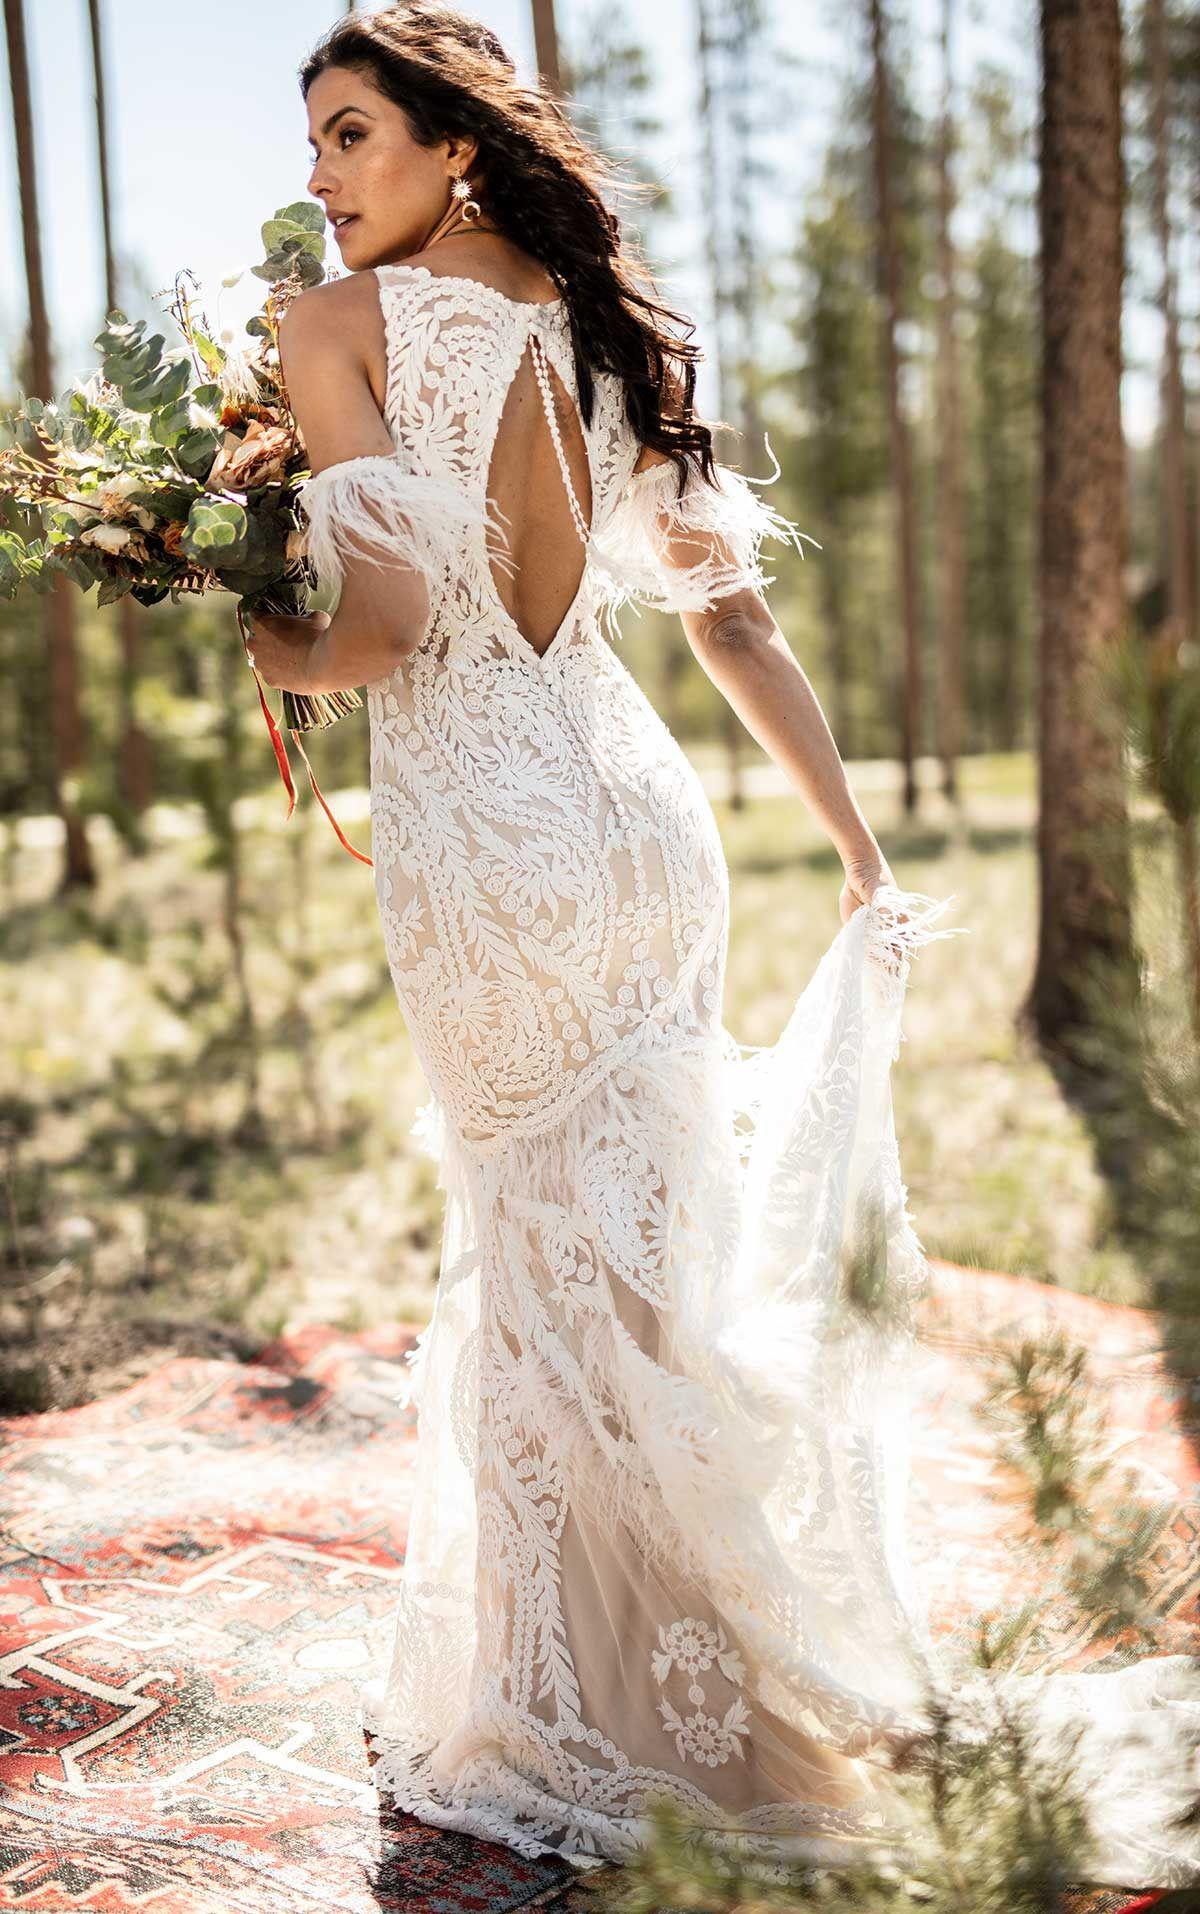 Rowen Wedding Dress All Who Wander Wedding Dress With Feathers Wedding Dresses Summer Wedding Dress [ 1914 x 1200 Pixel ]